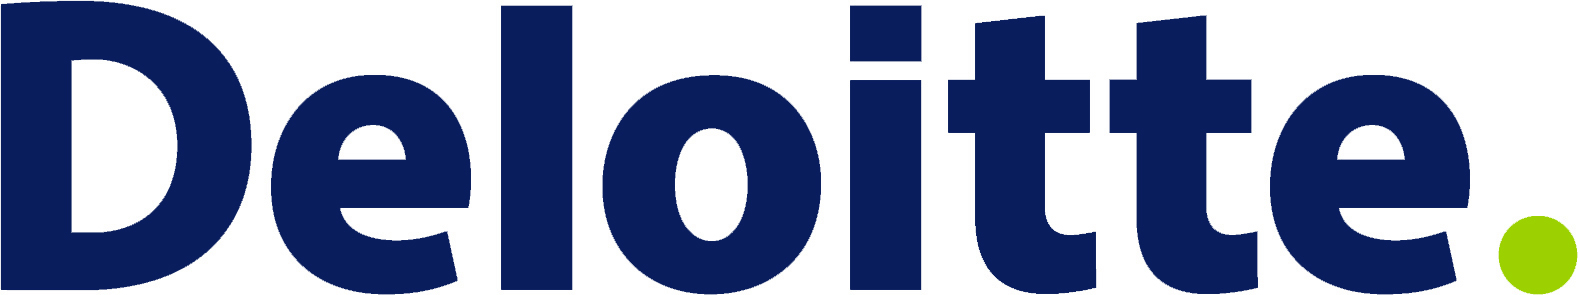 ComunidadMujer deloitte-logo-2011